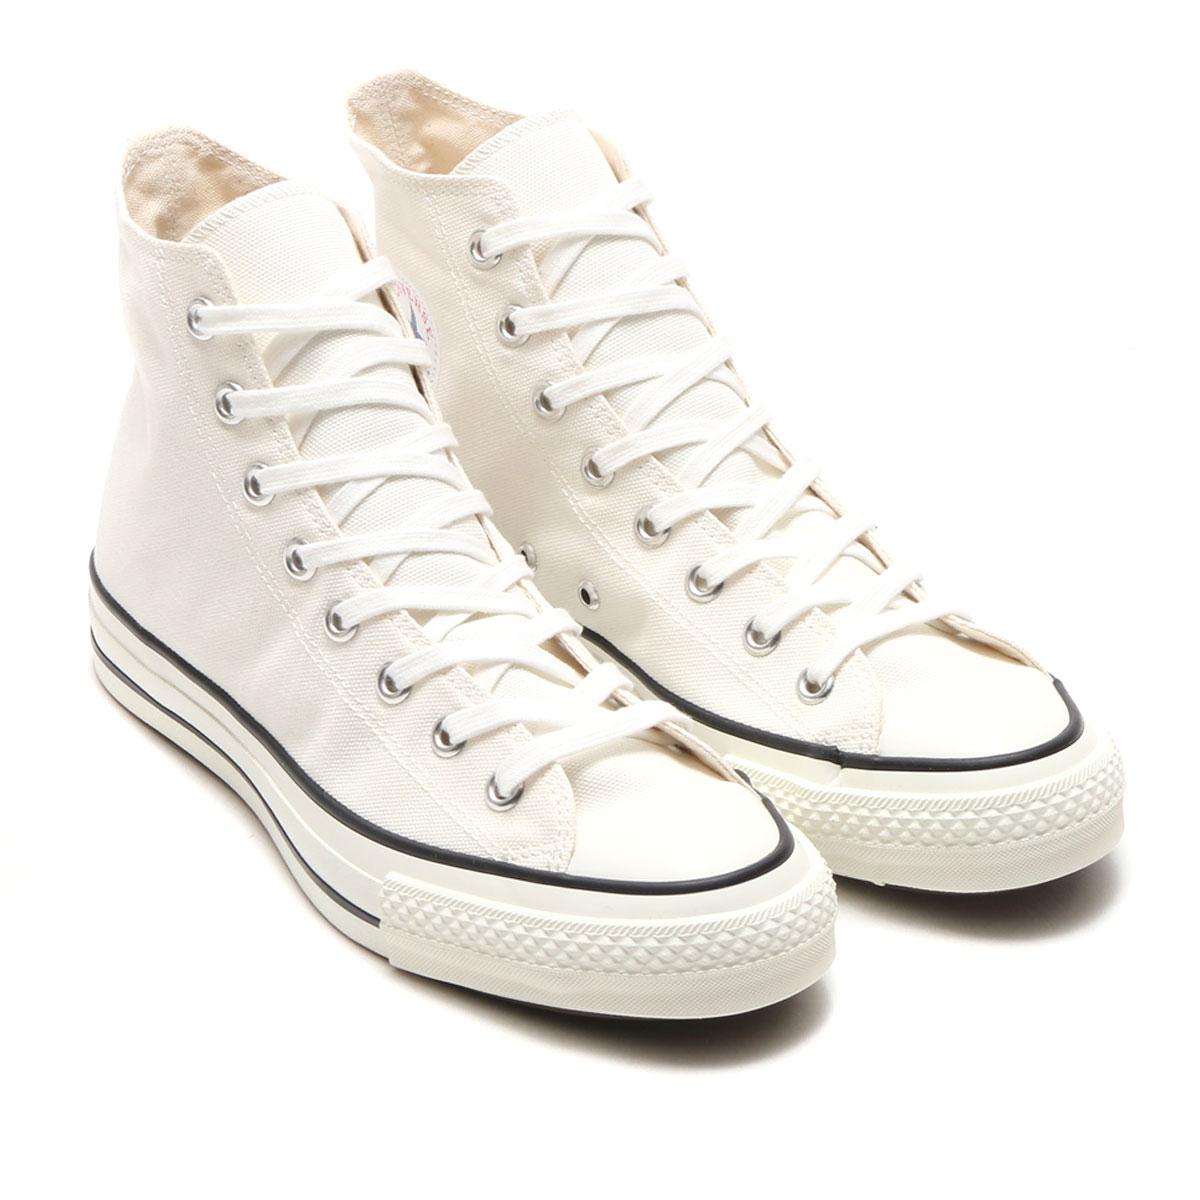 CONVERSE CANVAS ALL STAR J HI【コンバース キャンバス オールスター ハイ】WHITE【メンズ レディース スニーカー】【定番】 CRYOVR